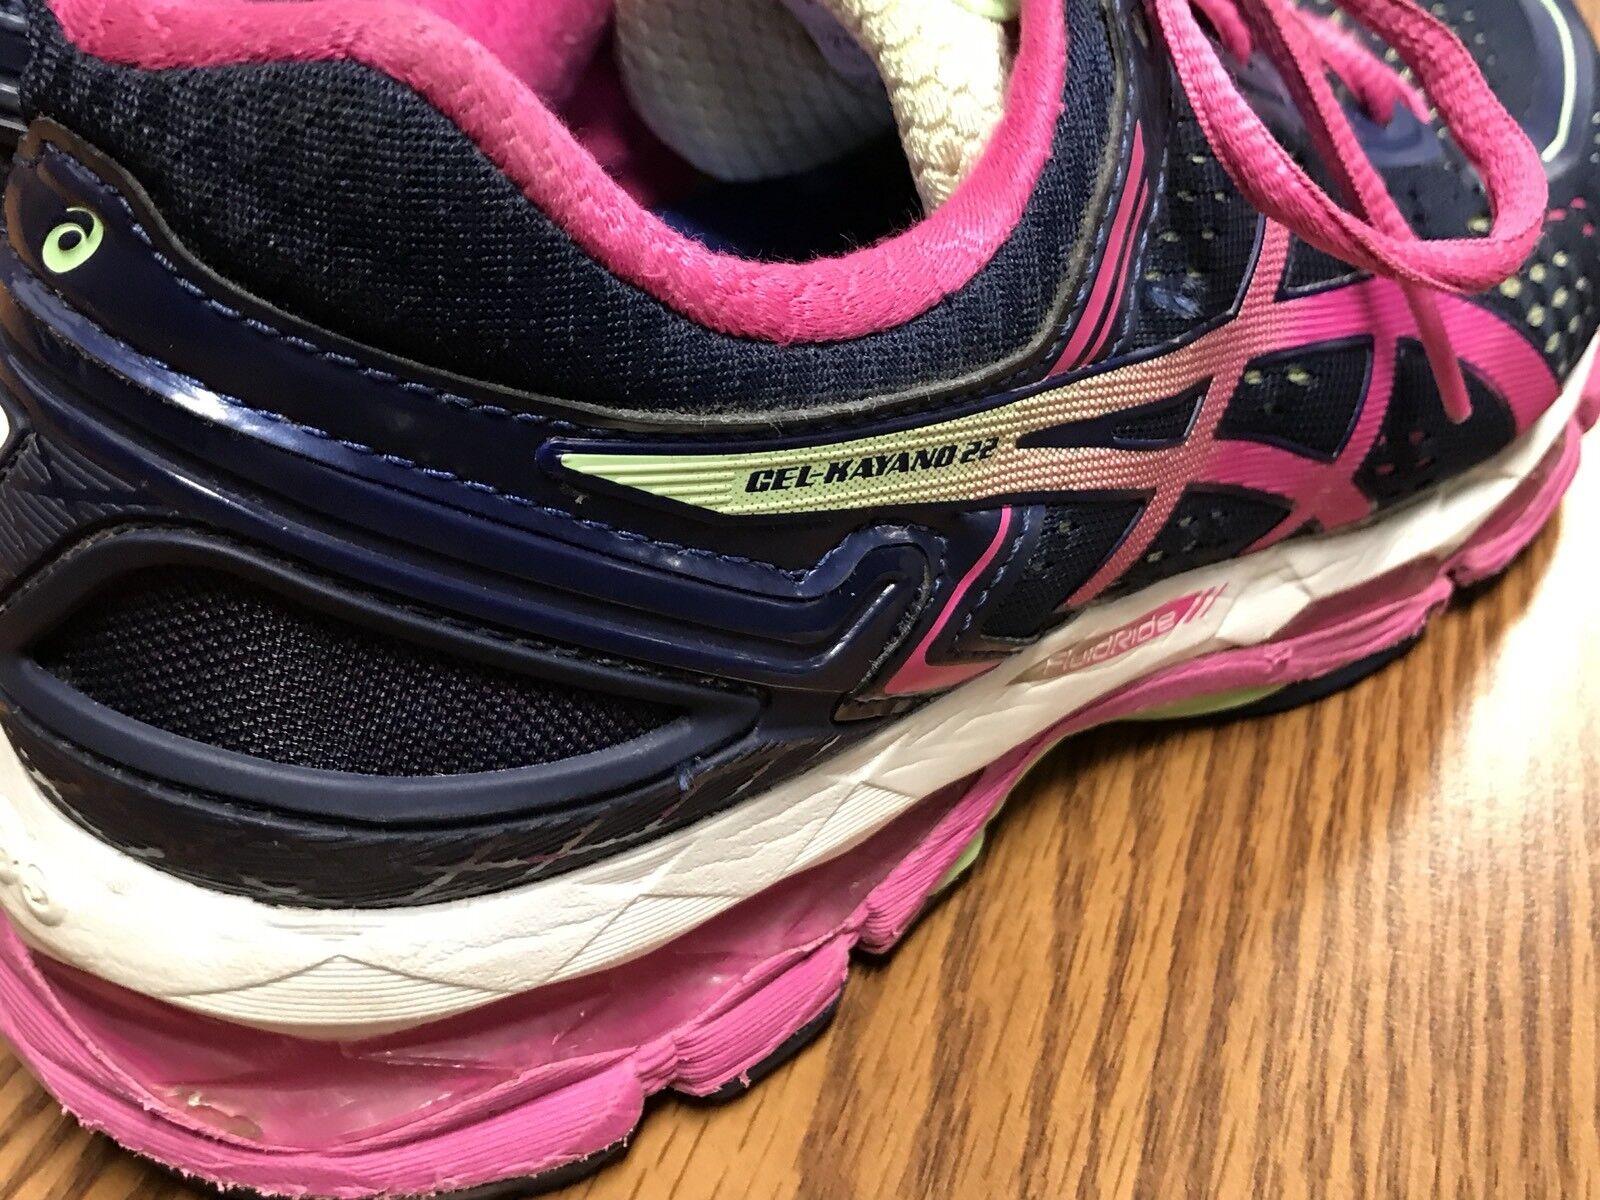 Asics T597N Gel Kayano 22 Azul rosado blancoo Mujer Correr Para Calzado Deportivo Correr Mujer Talla 7.5 4c96b1